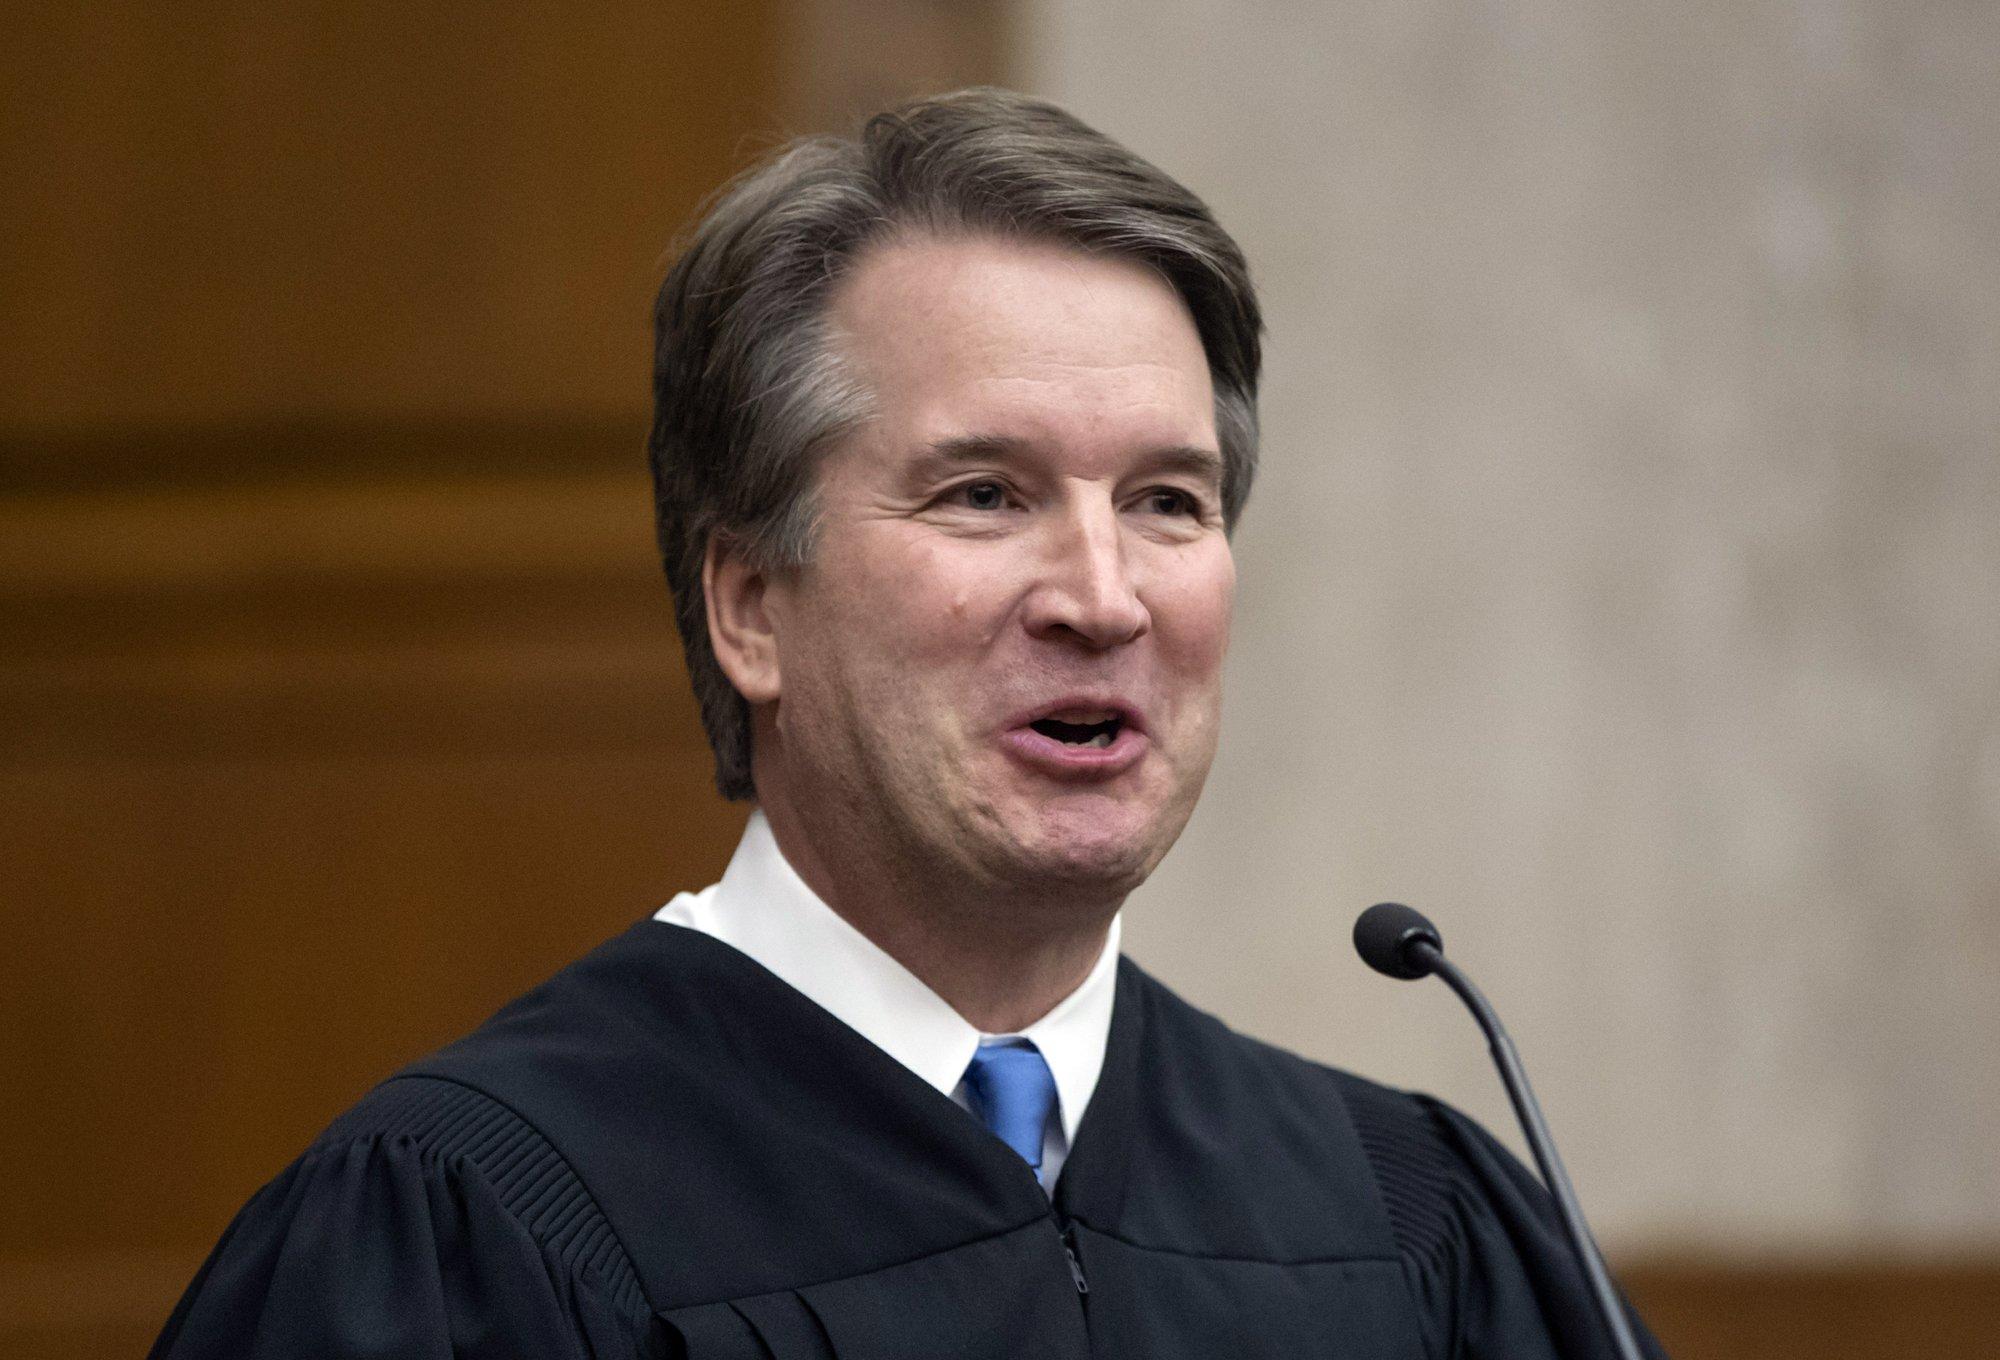 Kavanaugh in memo argued against indicting sitting president